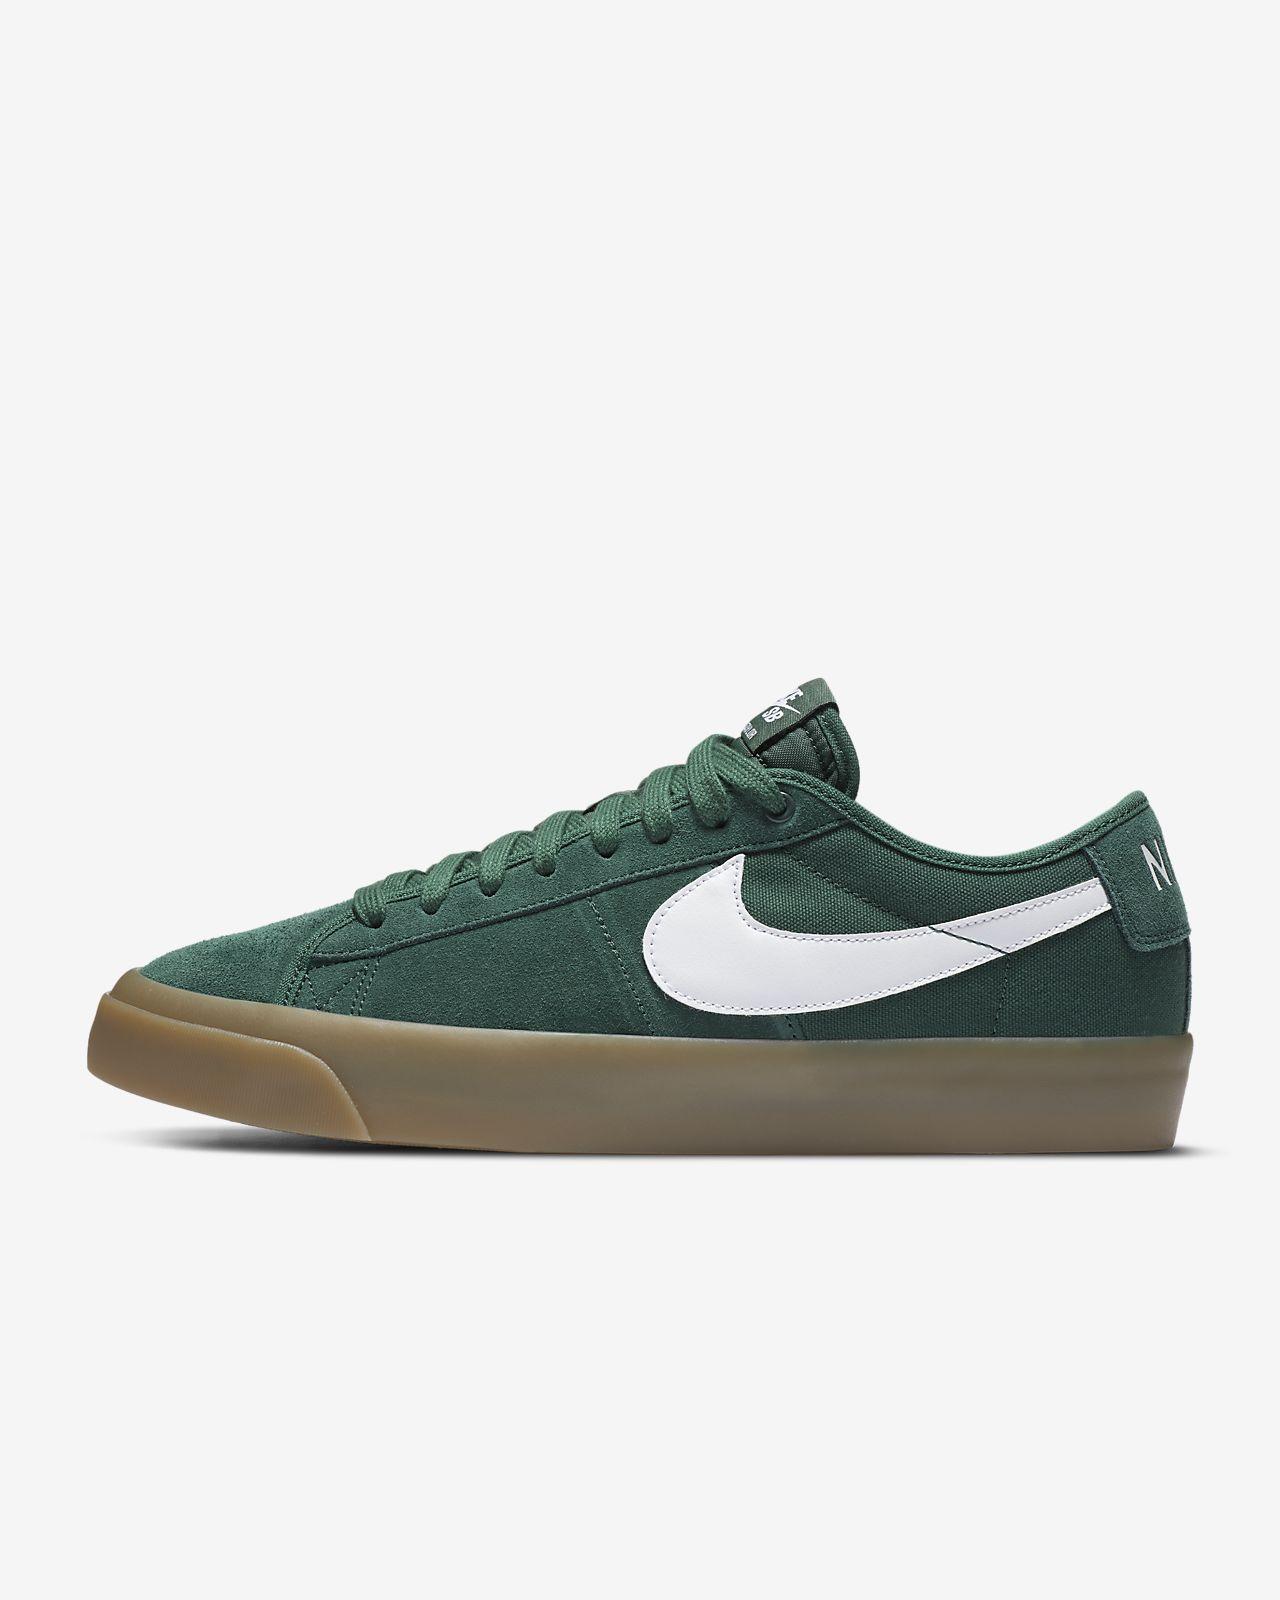 Nike SB Zoom Blazer Low Pro GT QS 男/女滑板鞋